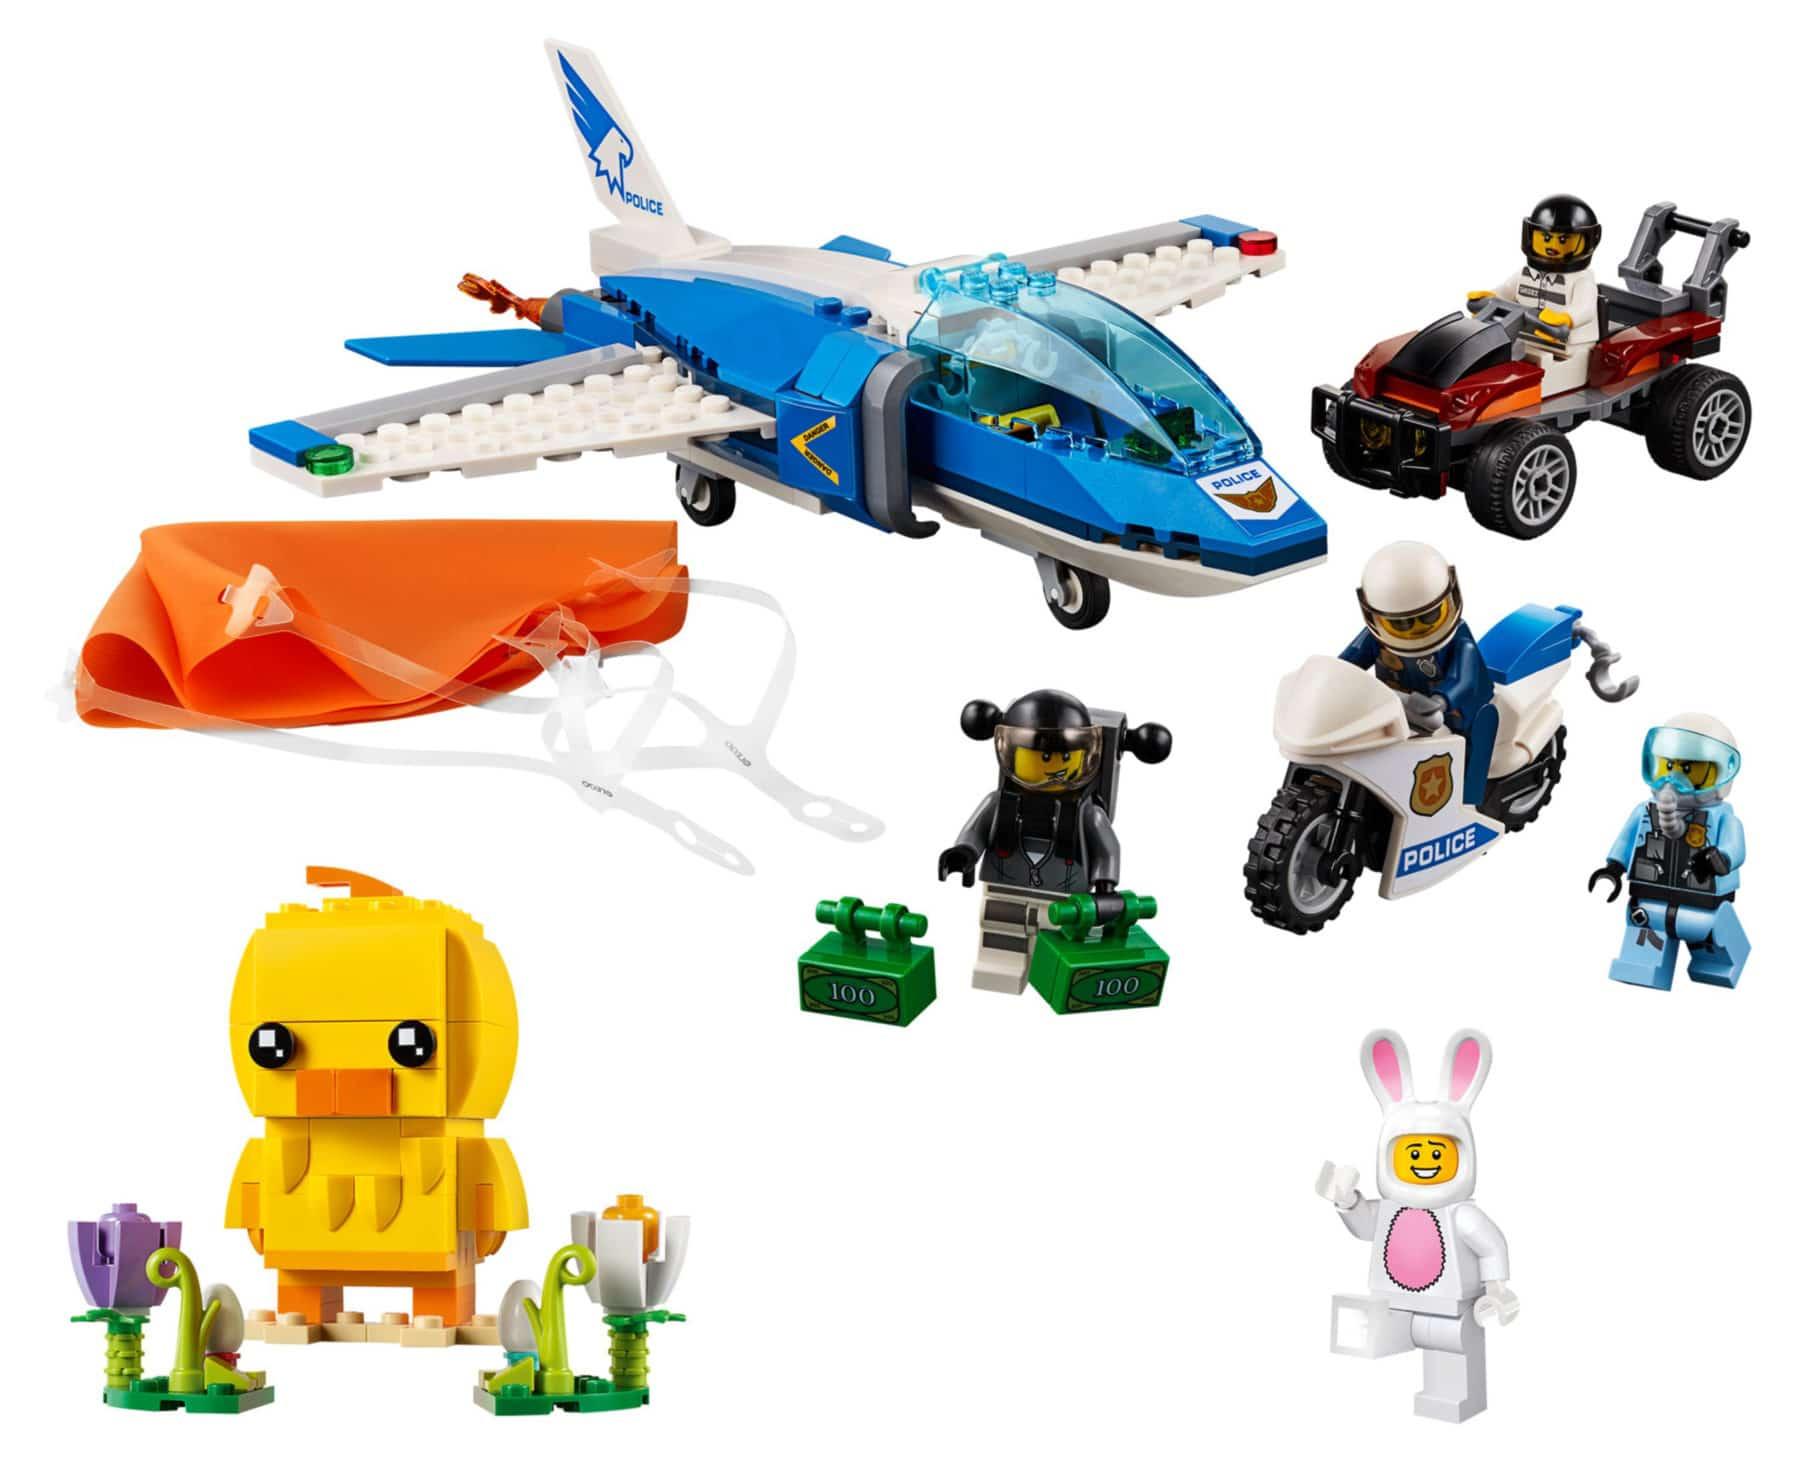 LEGO City Ostern Bundle 5005830